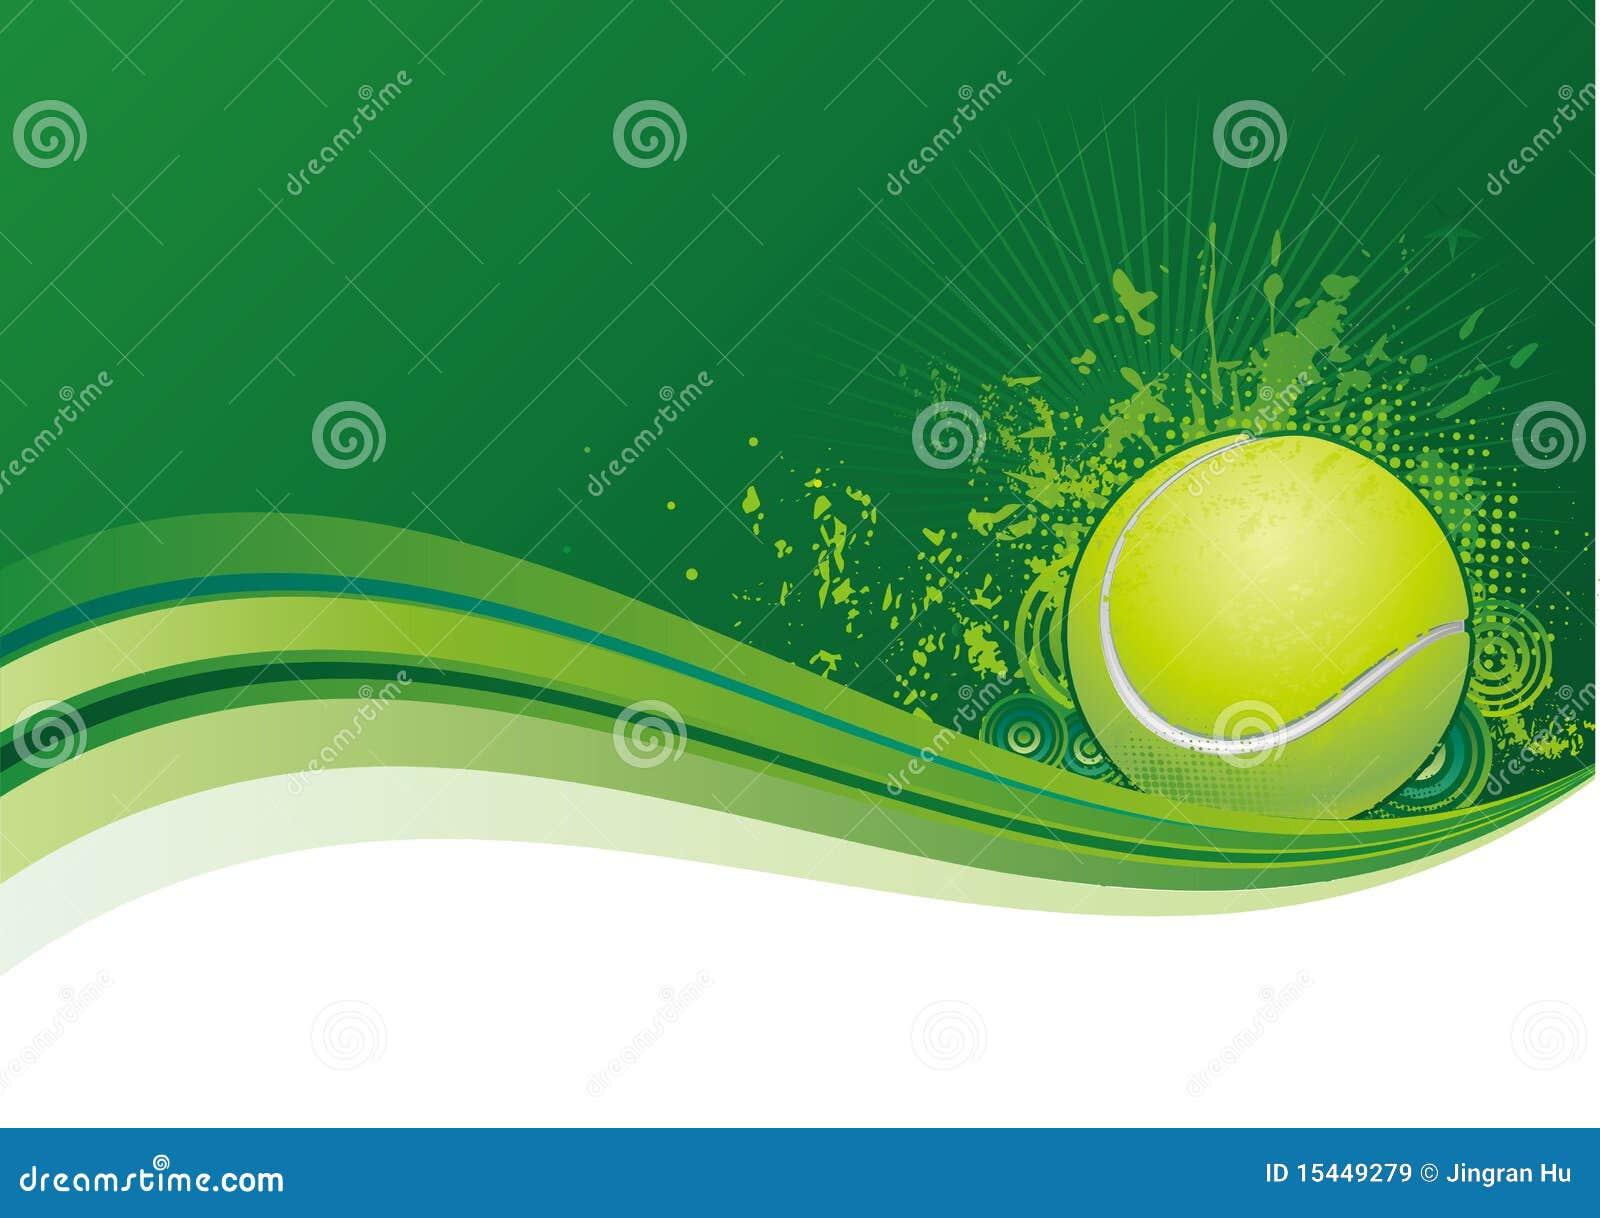 tennis wallpaper border